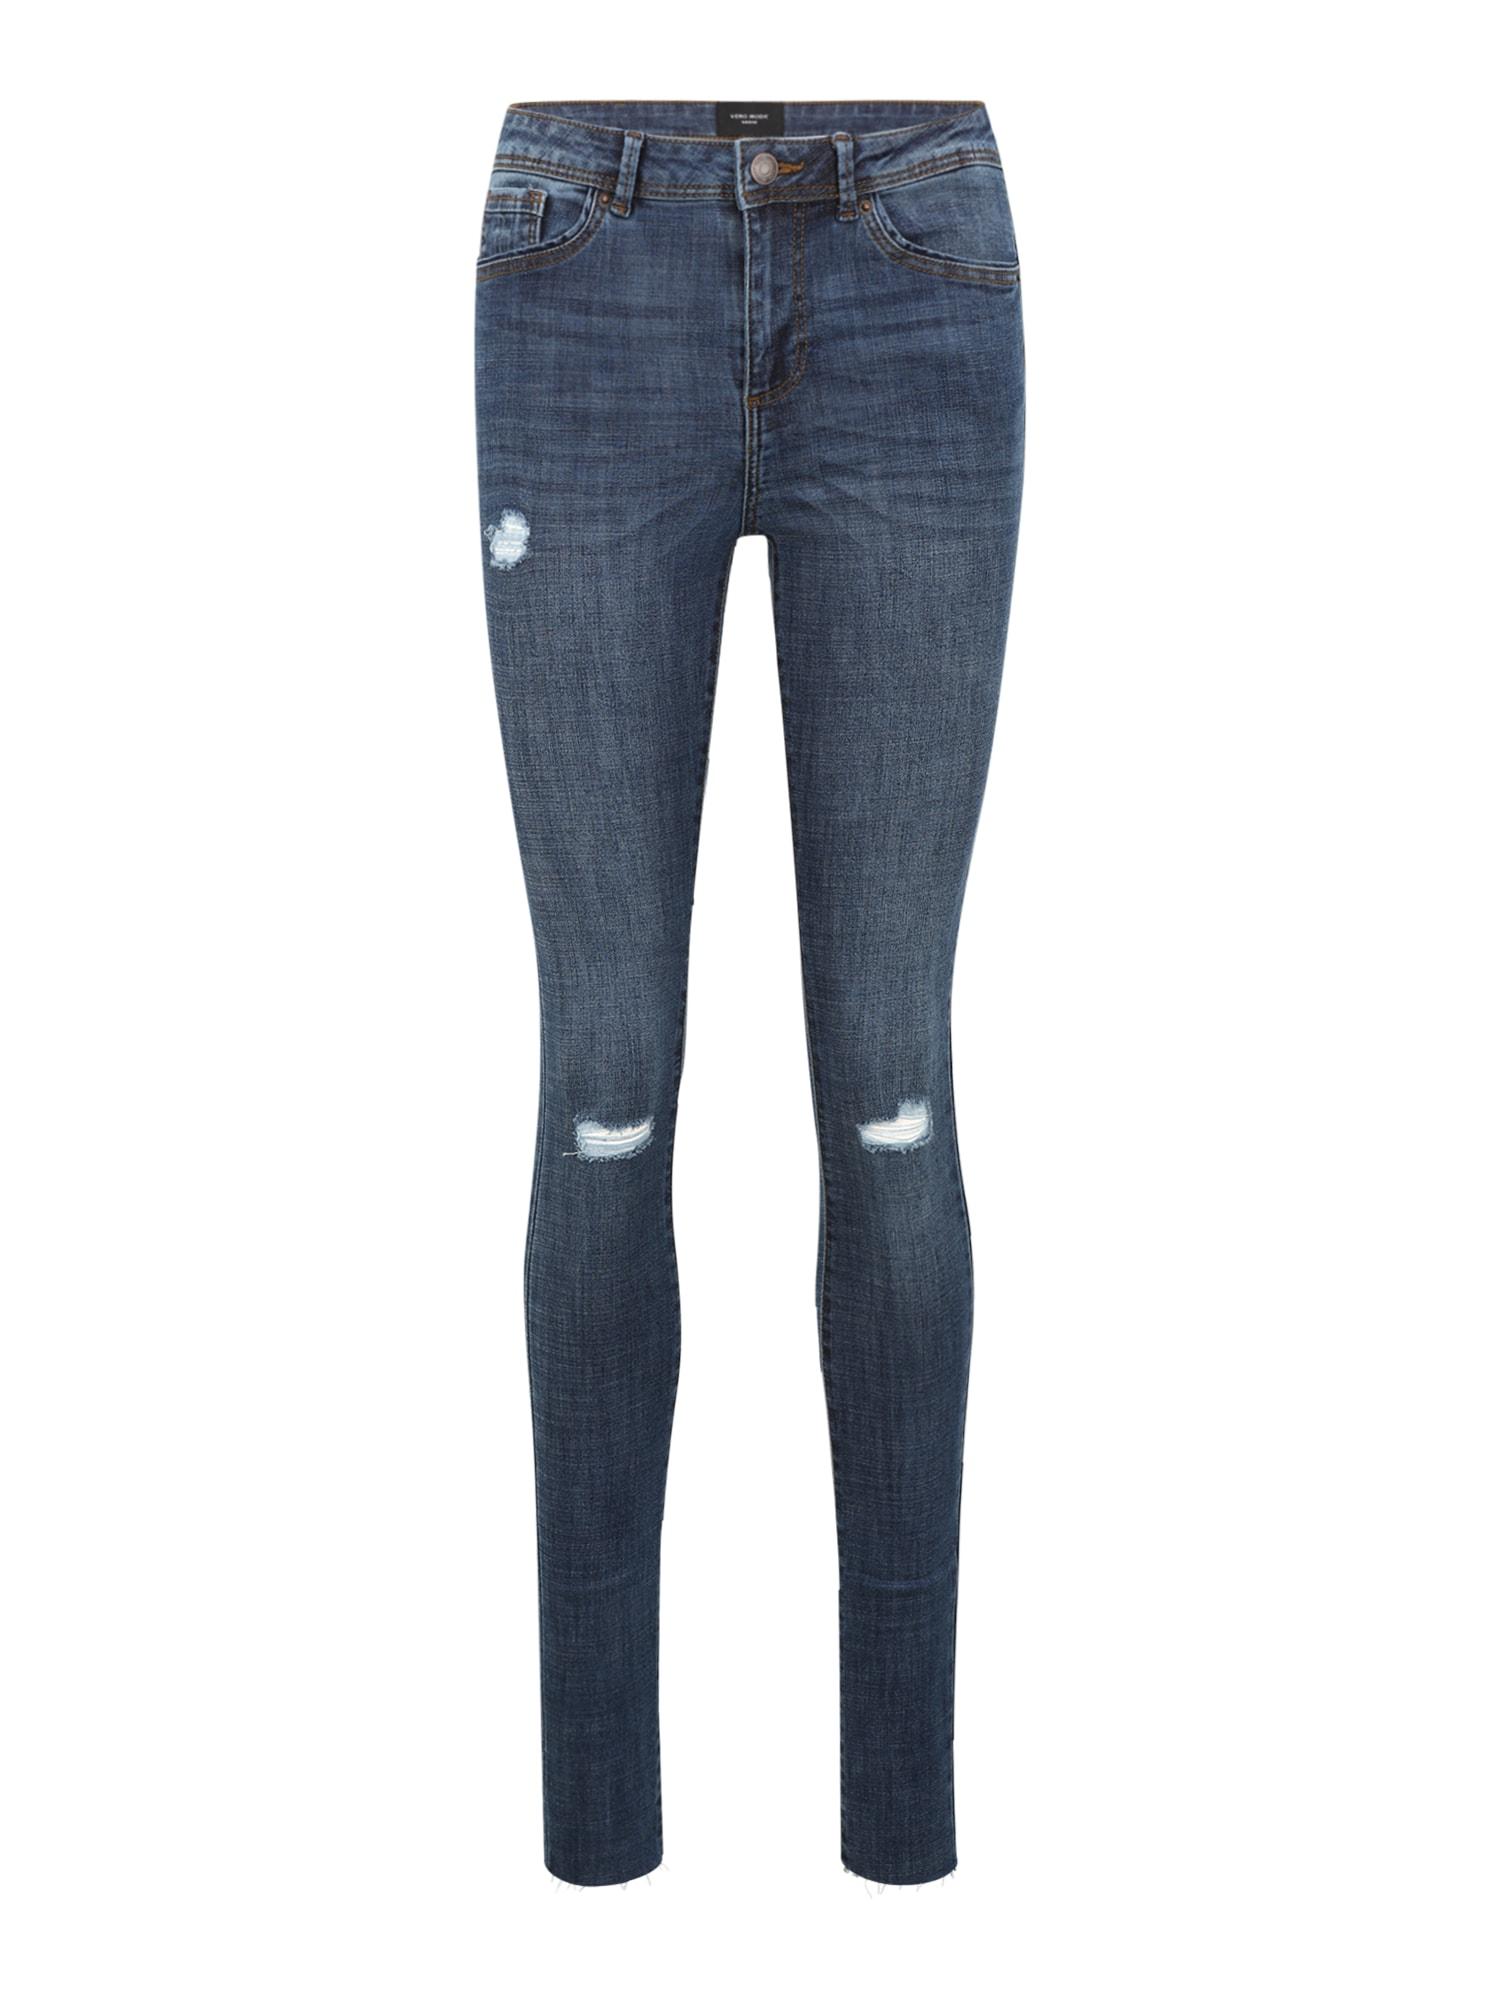 Vero Moda Tall Džinsai tamsiai (džinso) mėlyna